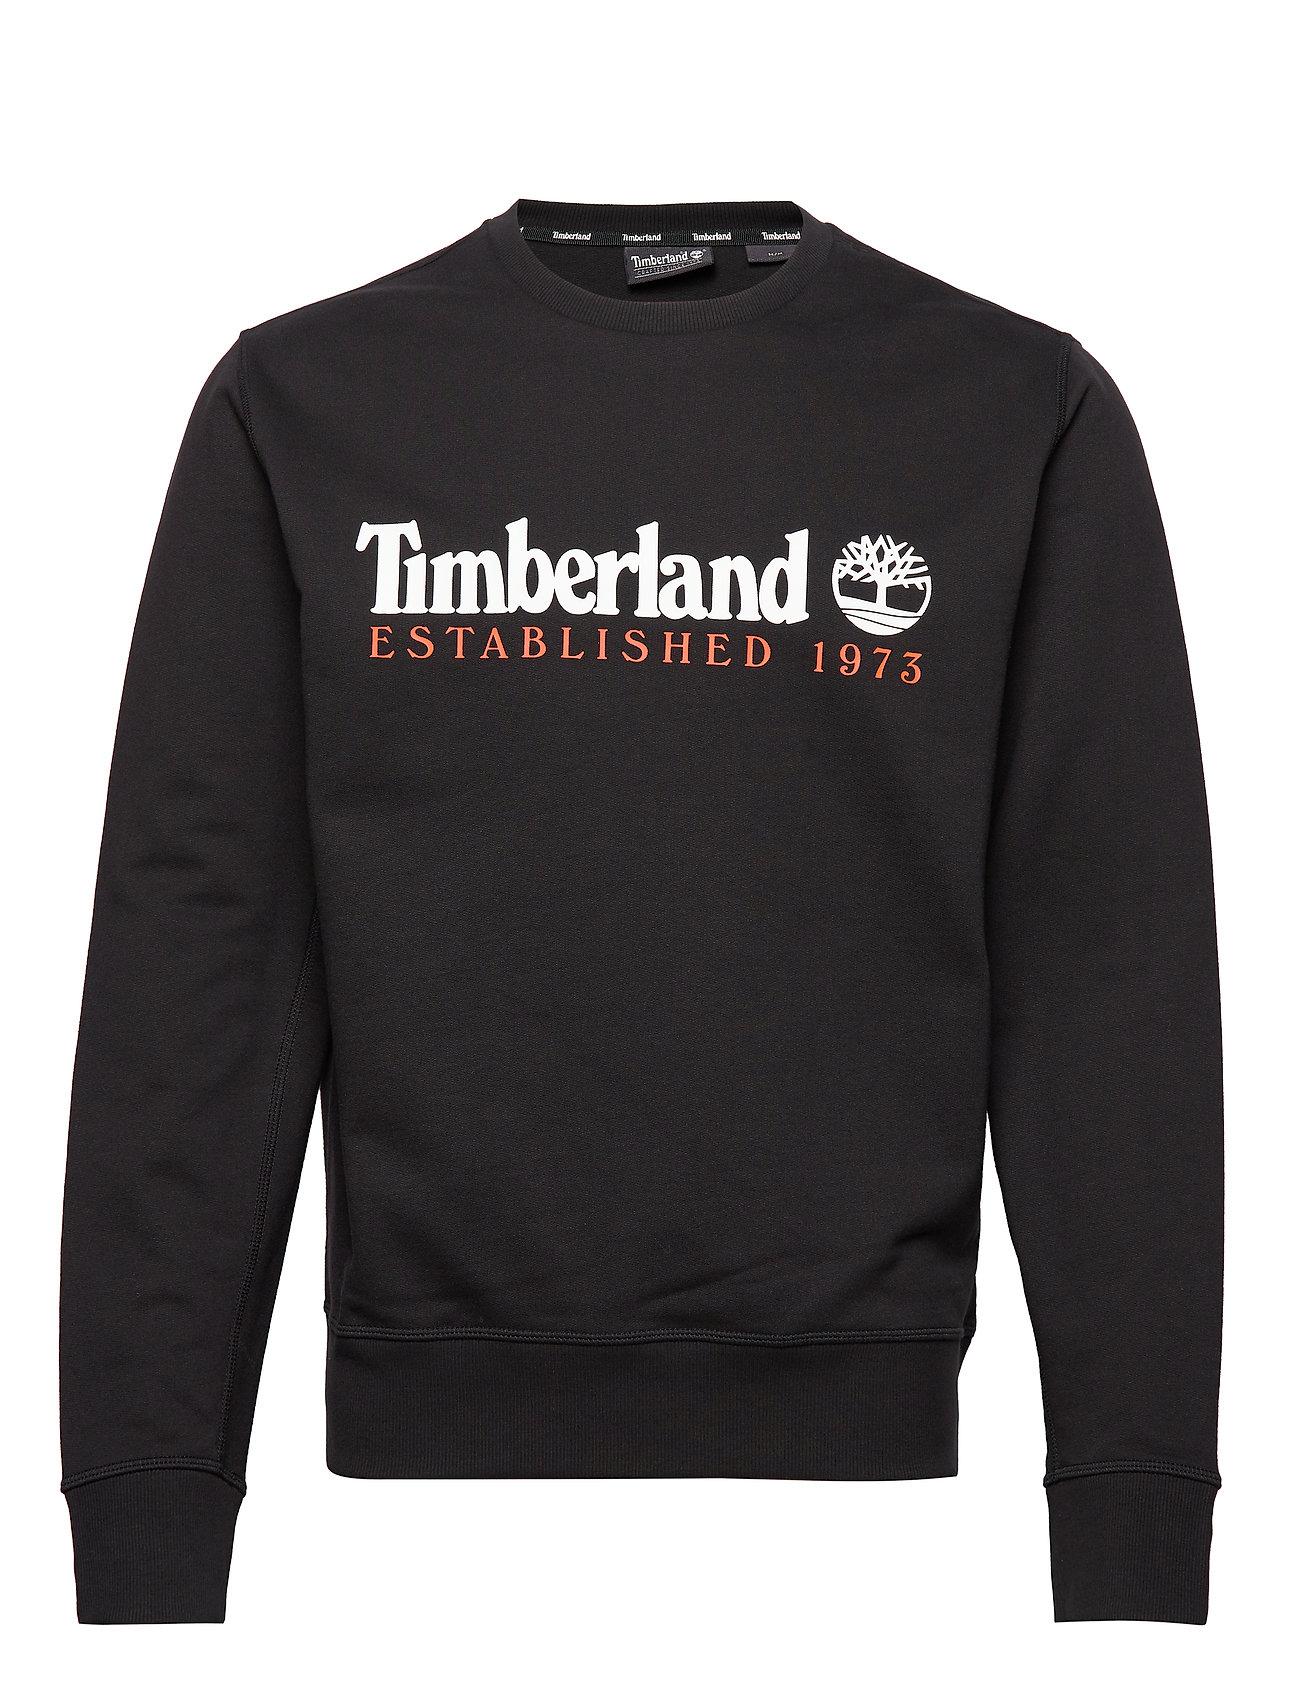 Timberland Essential Established 1973 Crew Sweat - BLACK